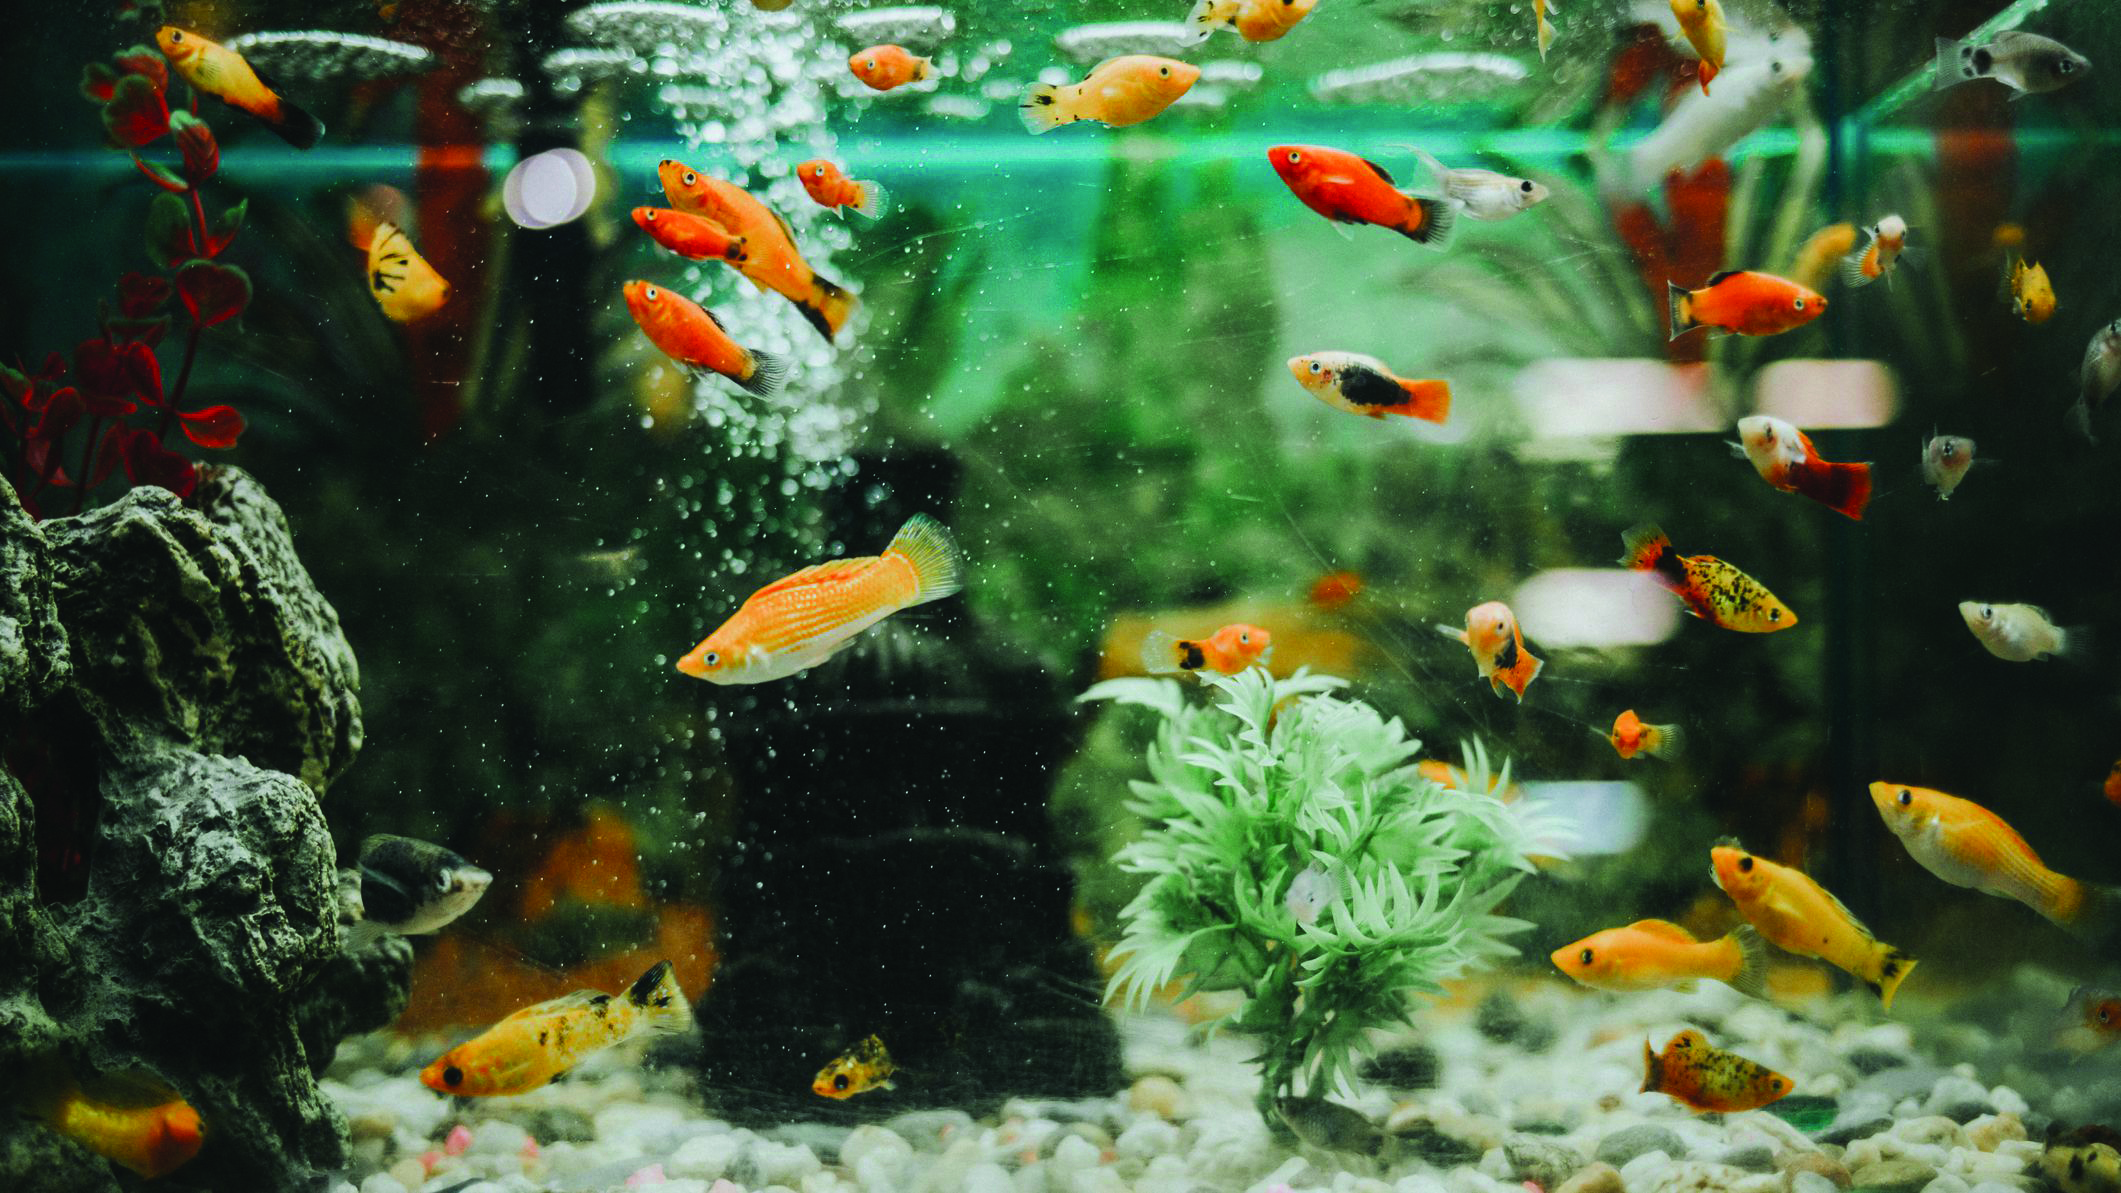 The Expert guide for stocking an aquarium